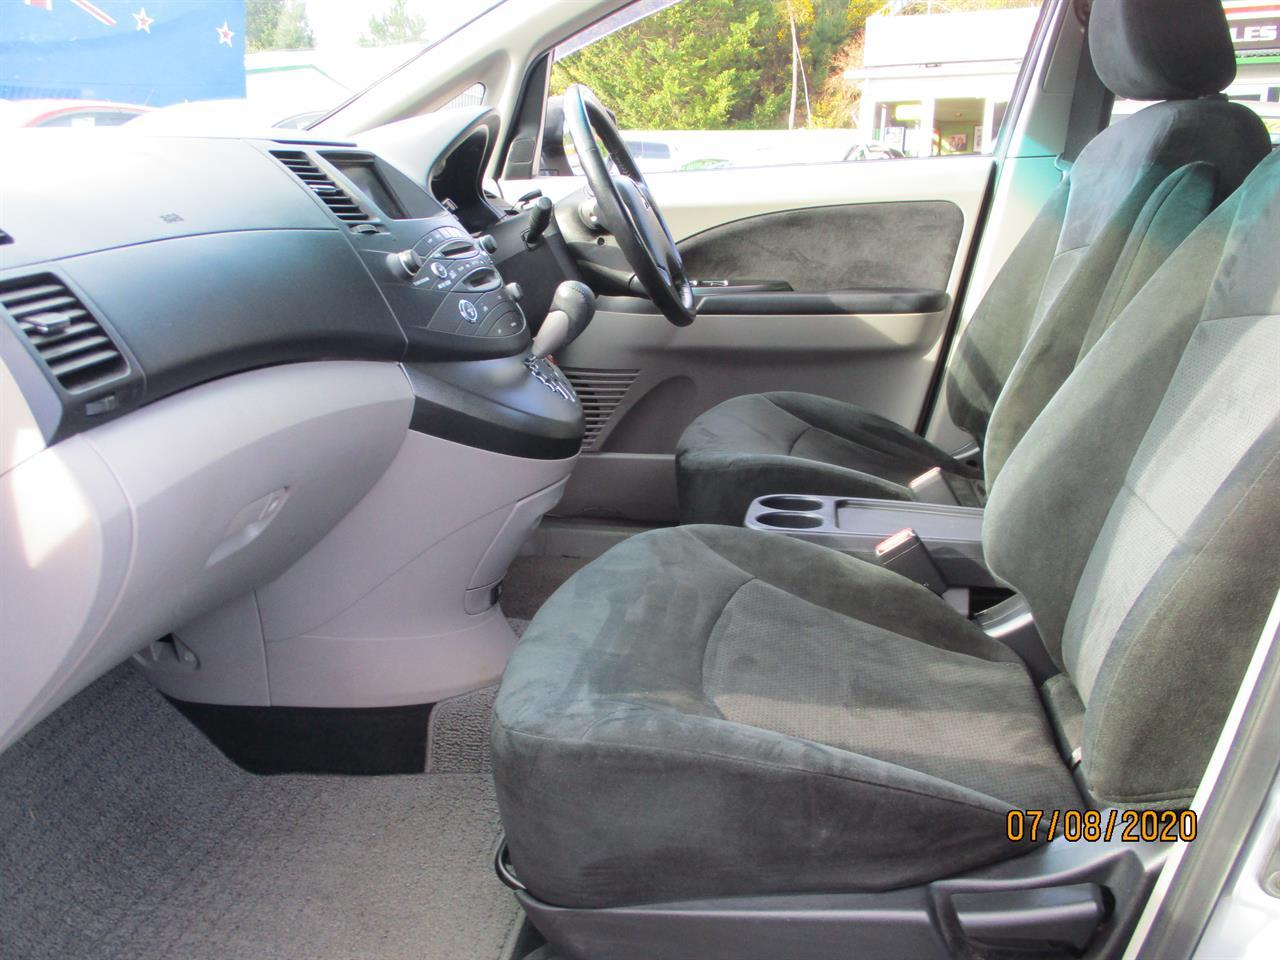 image-13, 2007 Mitsubishi Grandis 2.4 7 seater at Dunedin